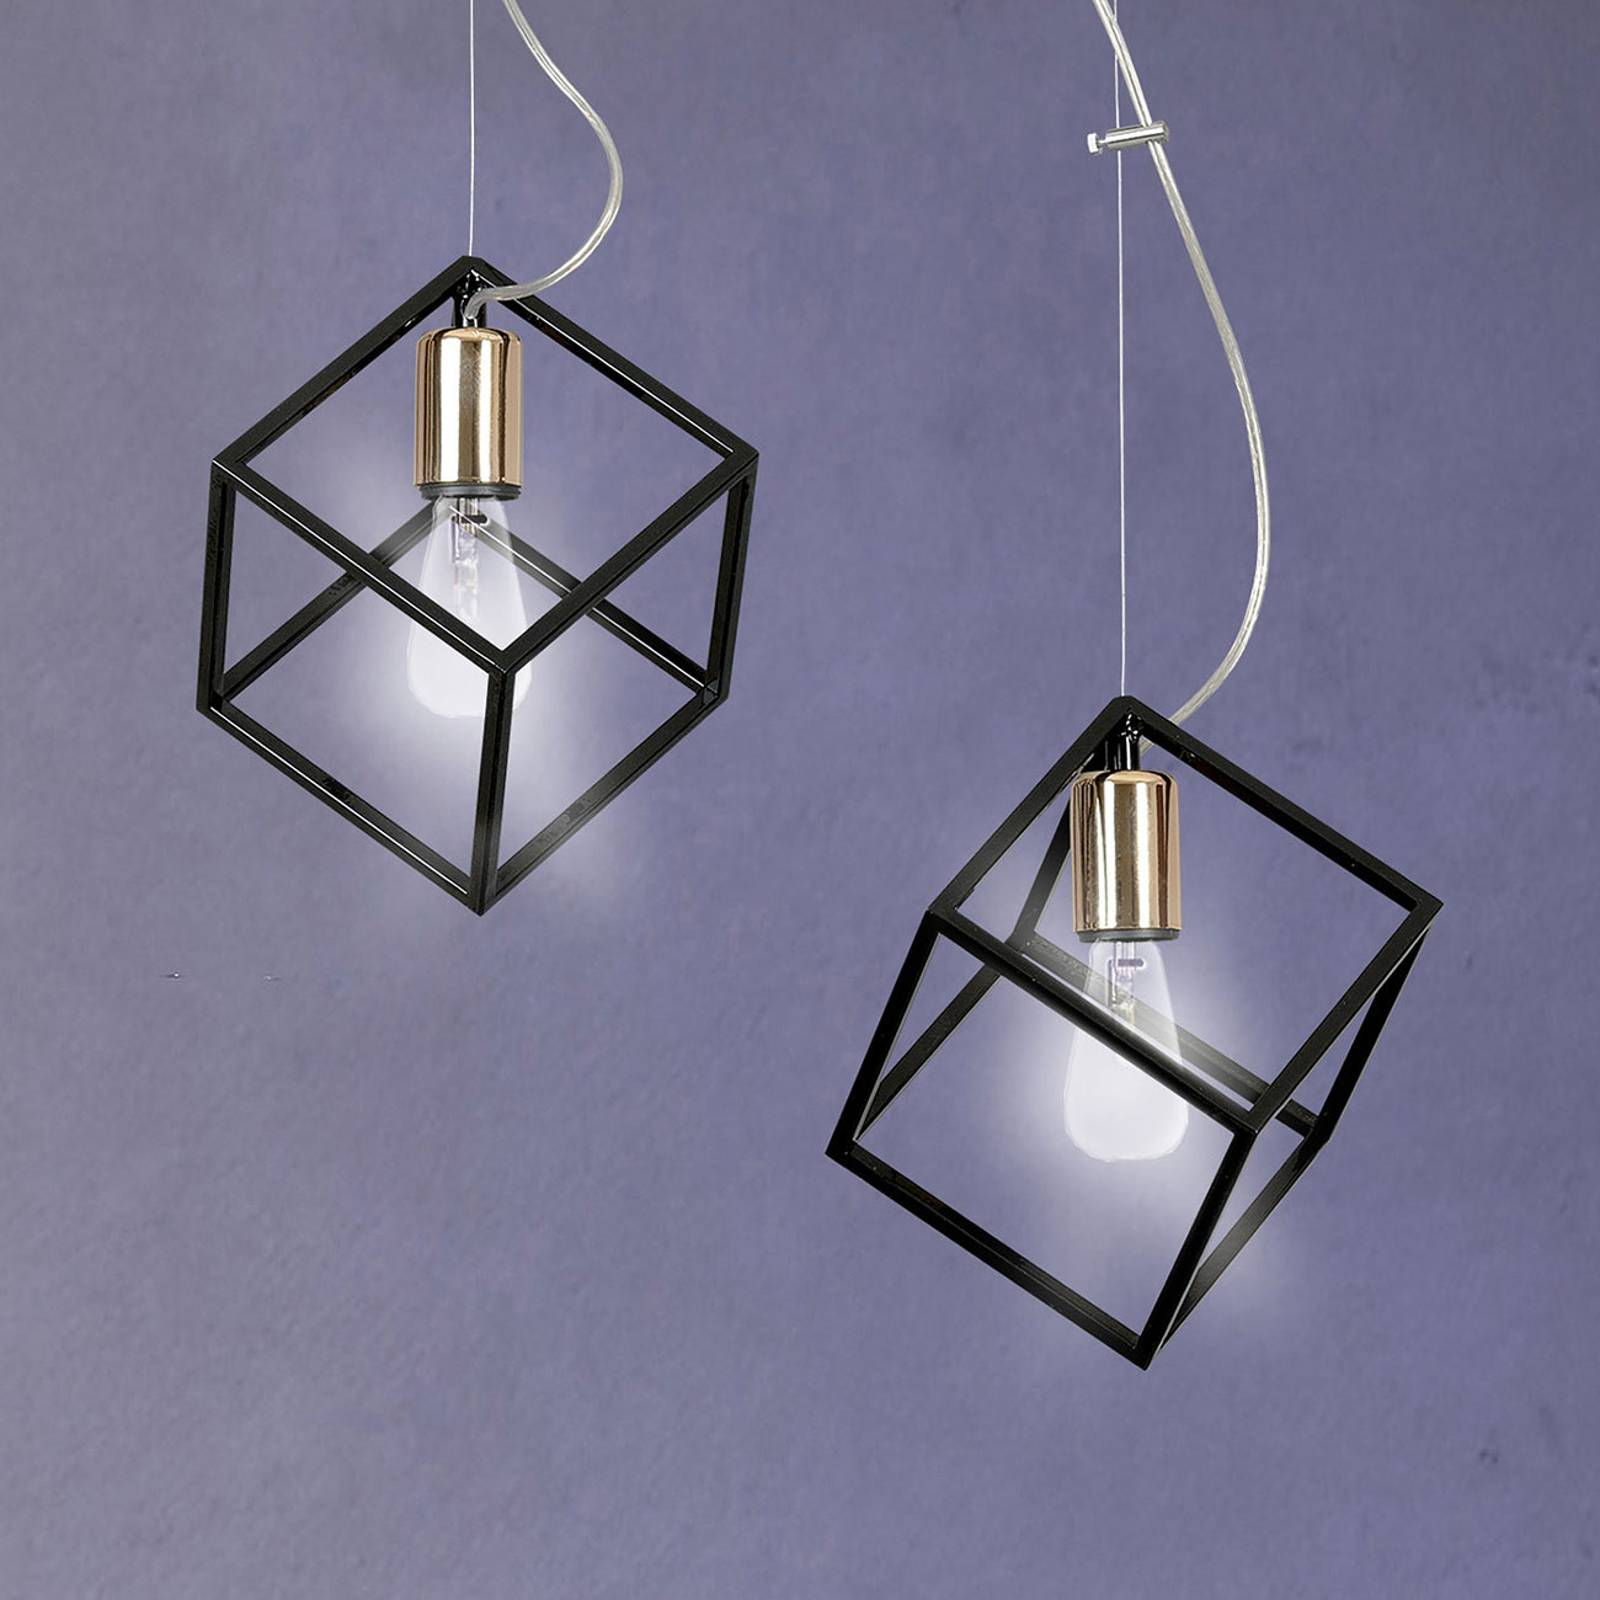 Hanglamp Ambition 2 2-lamps, zwart-goud